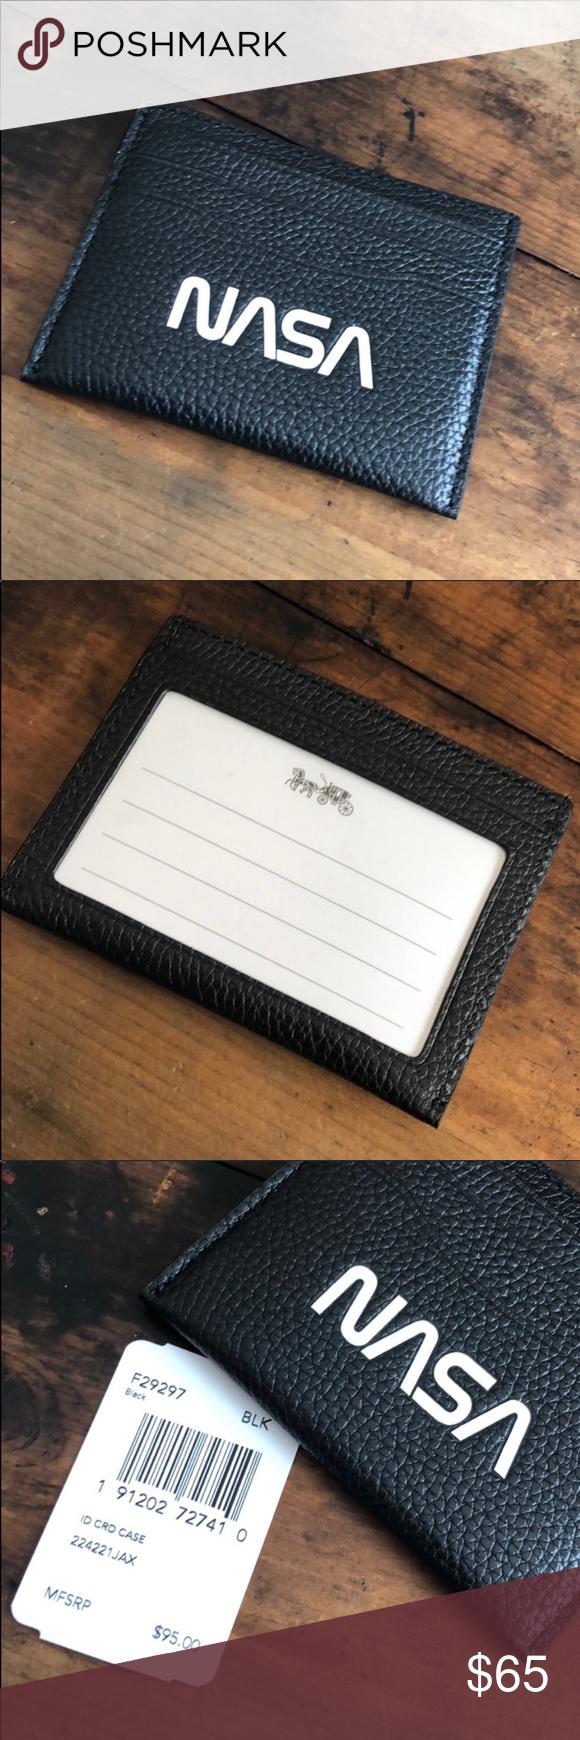 Coach Id Card Case Id Front Pocket Wallet Nasa Front Pocket Wallet Pocket Wallet Wallet